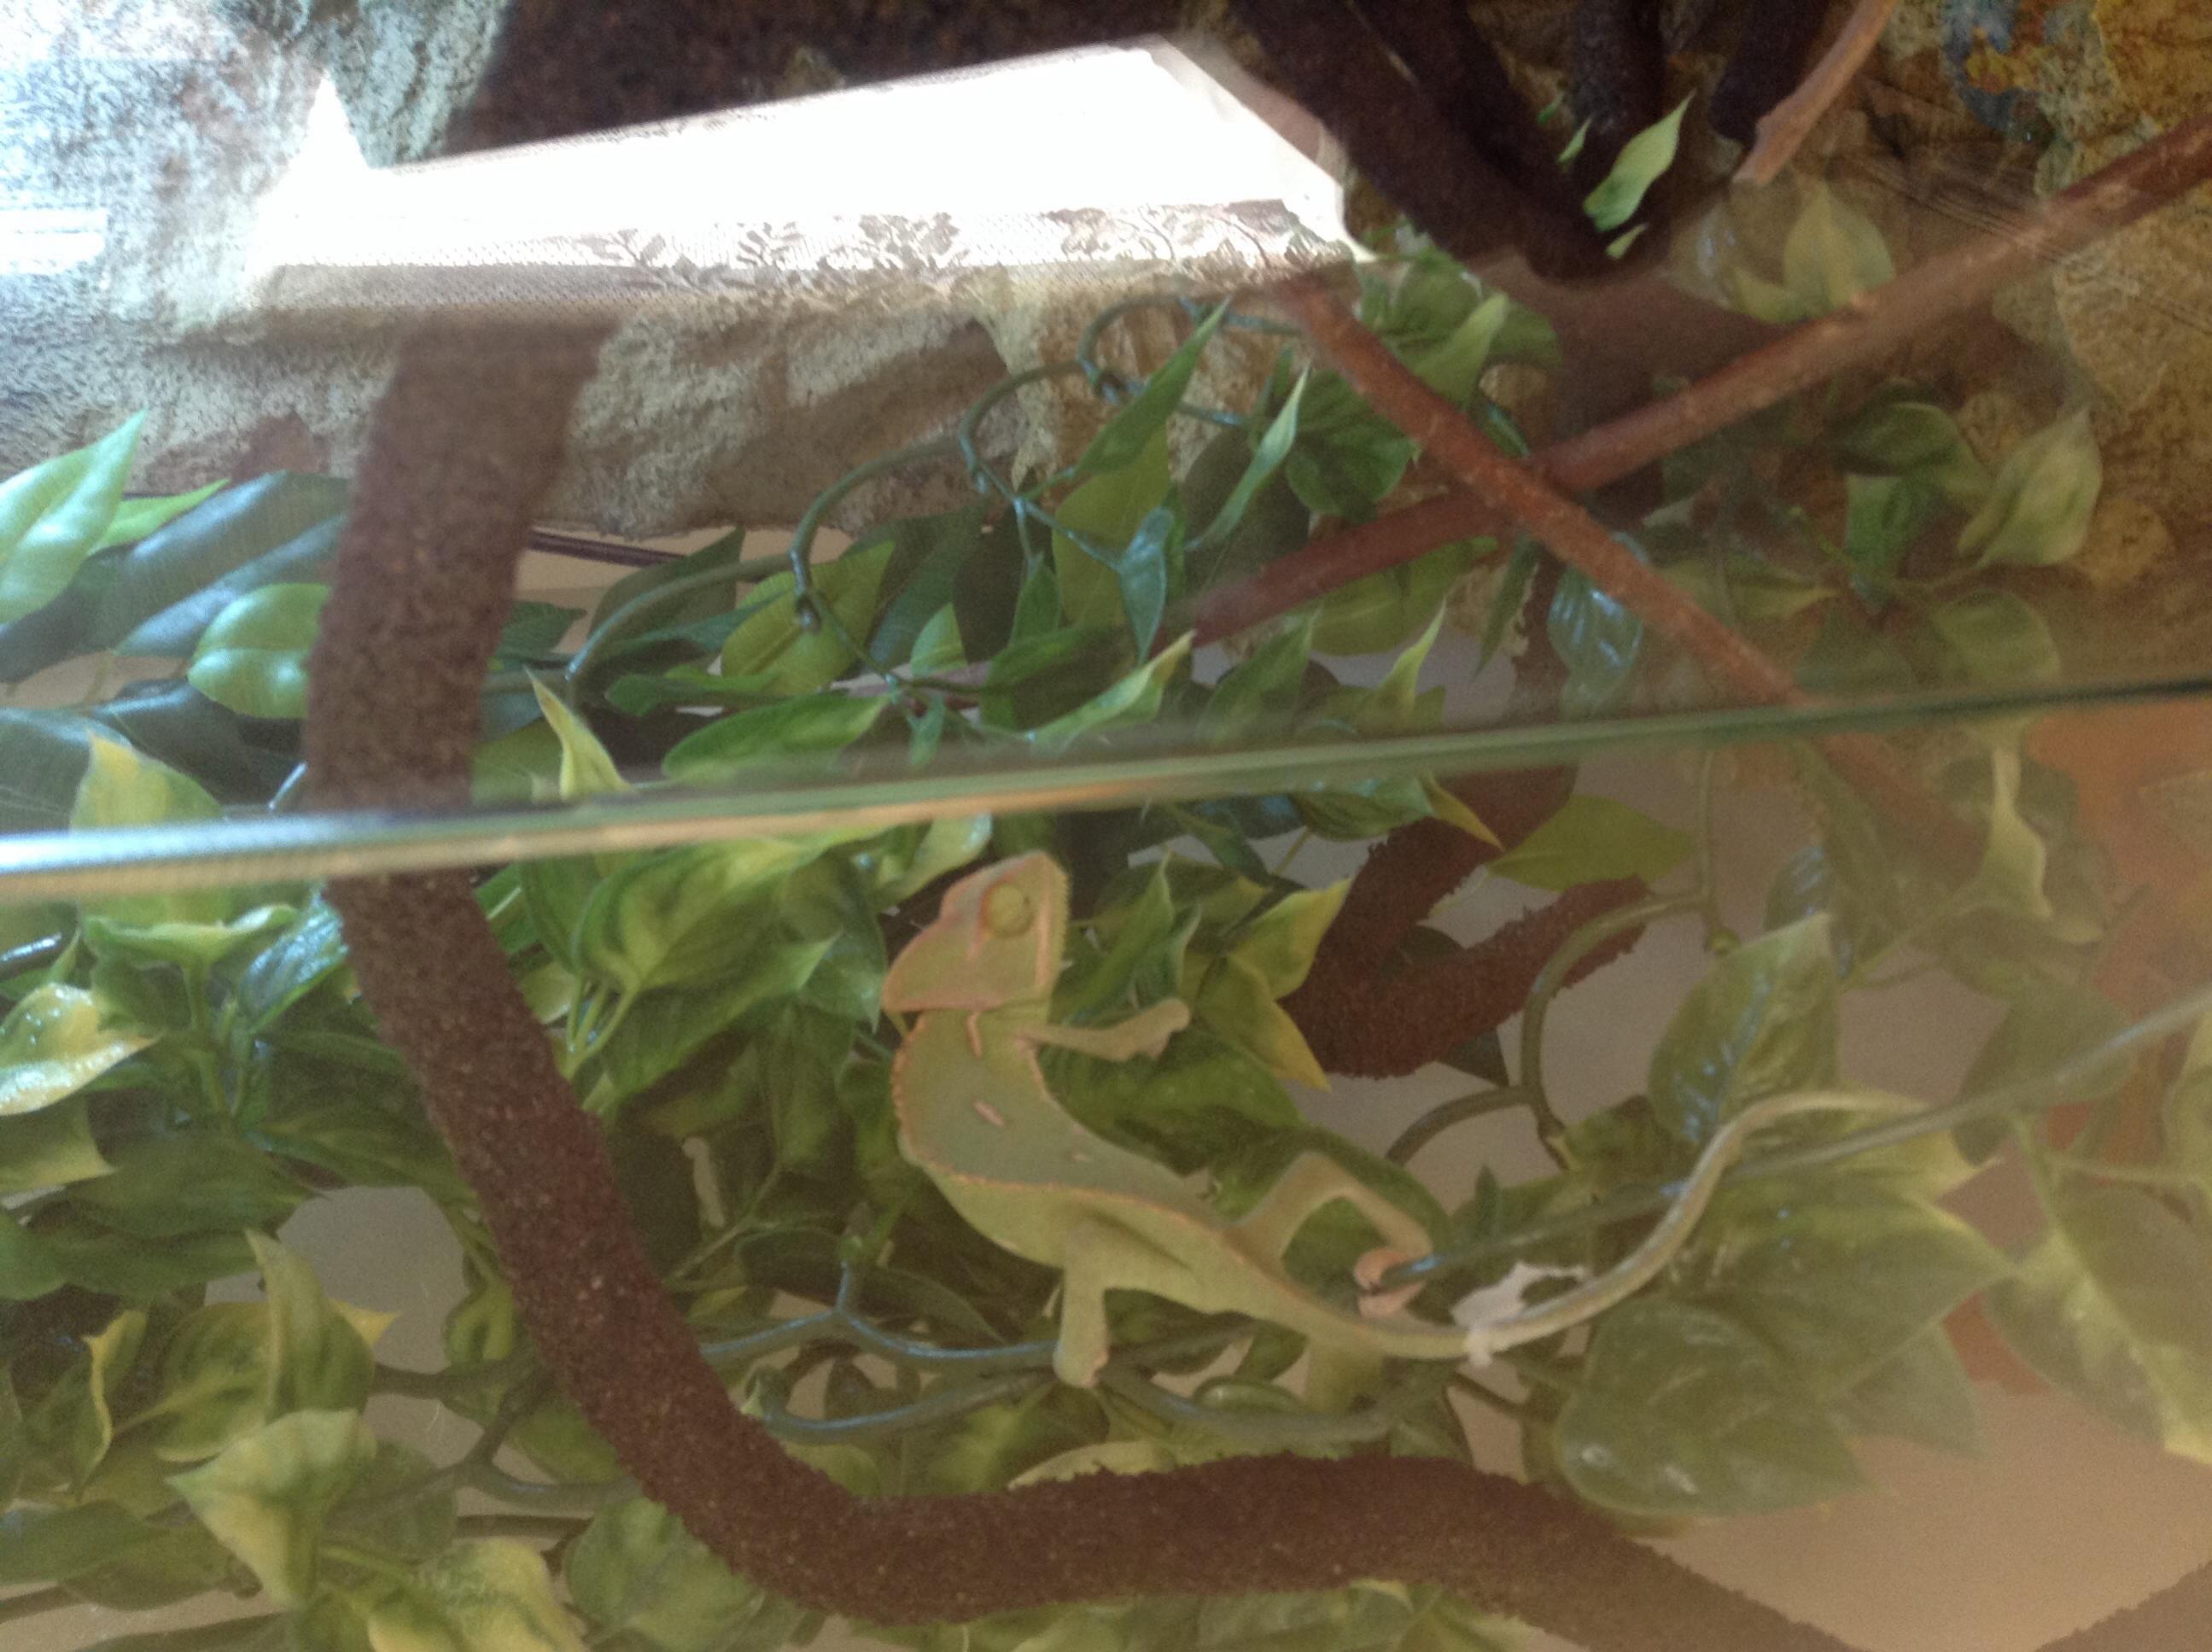 Sw England Veiled Chameleon 4 Months Old Glass Vivarium Full Setup Reptile Forums